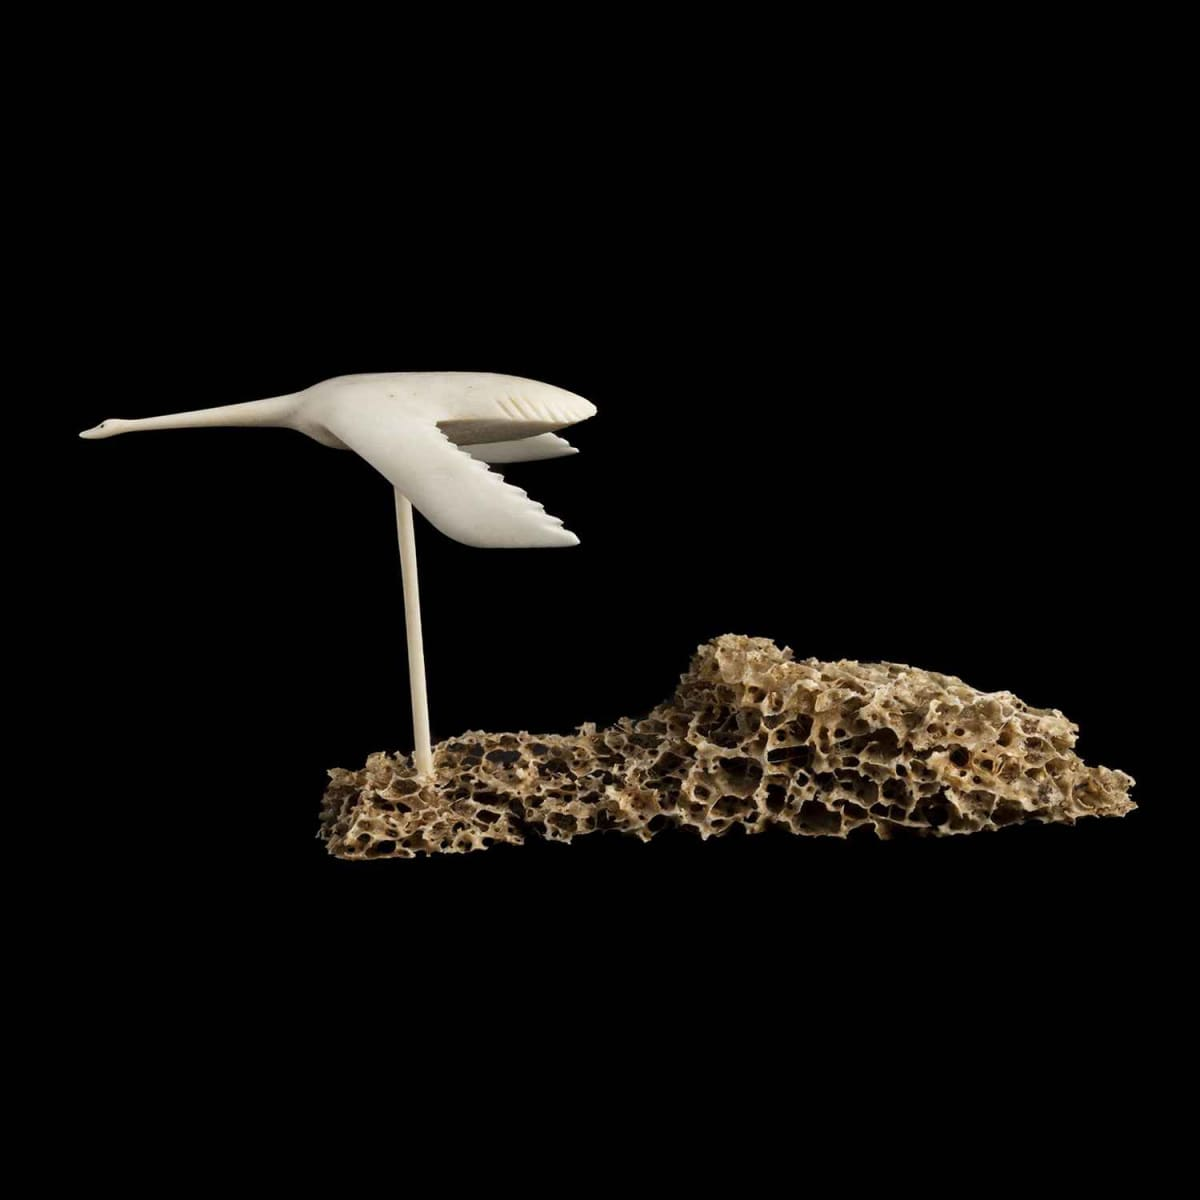 51. UNIDENTIFIED ARTIST, NAUJAAT (REPULSE BAY) Flying Bird, c. 1970